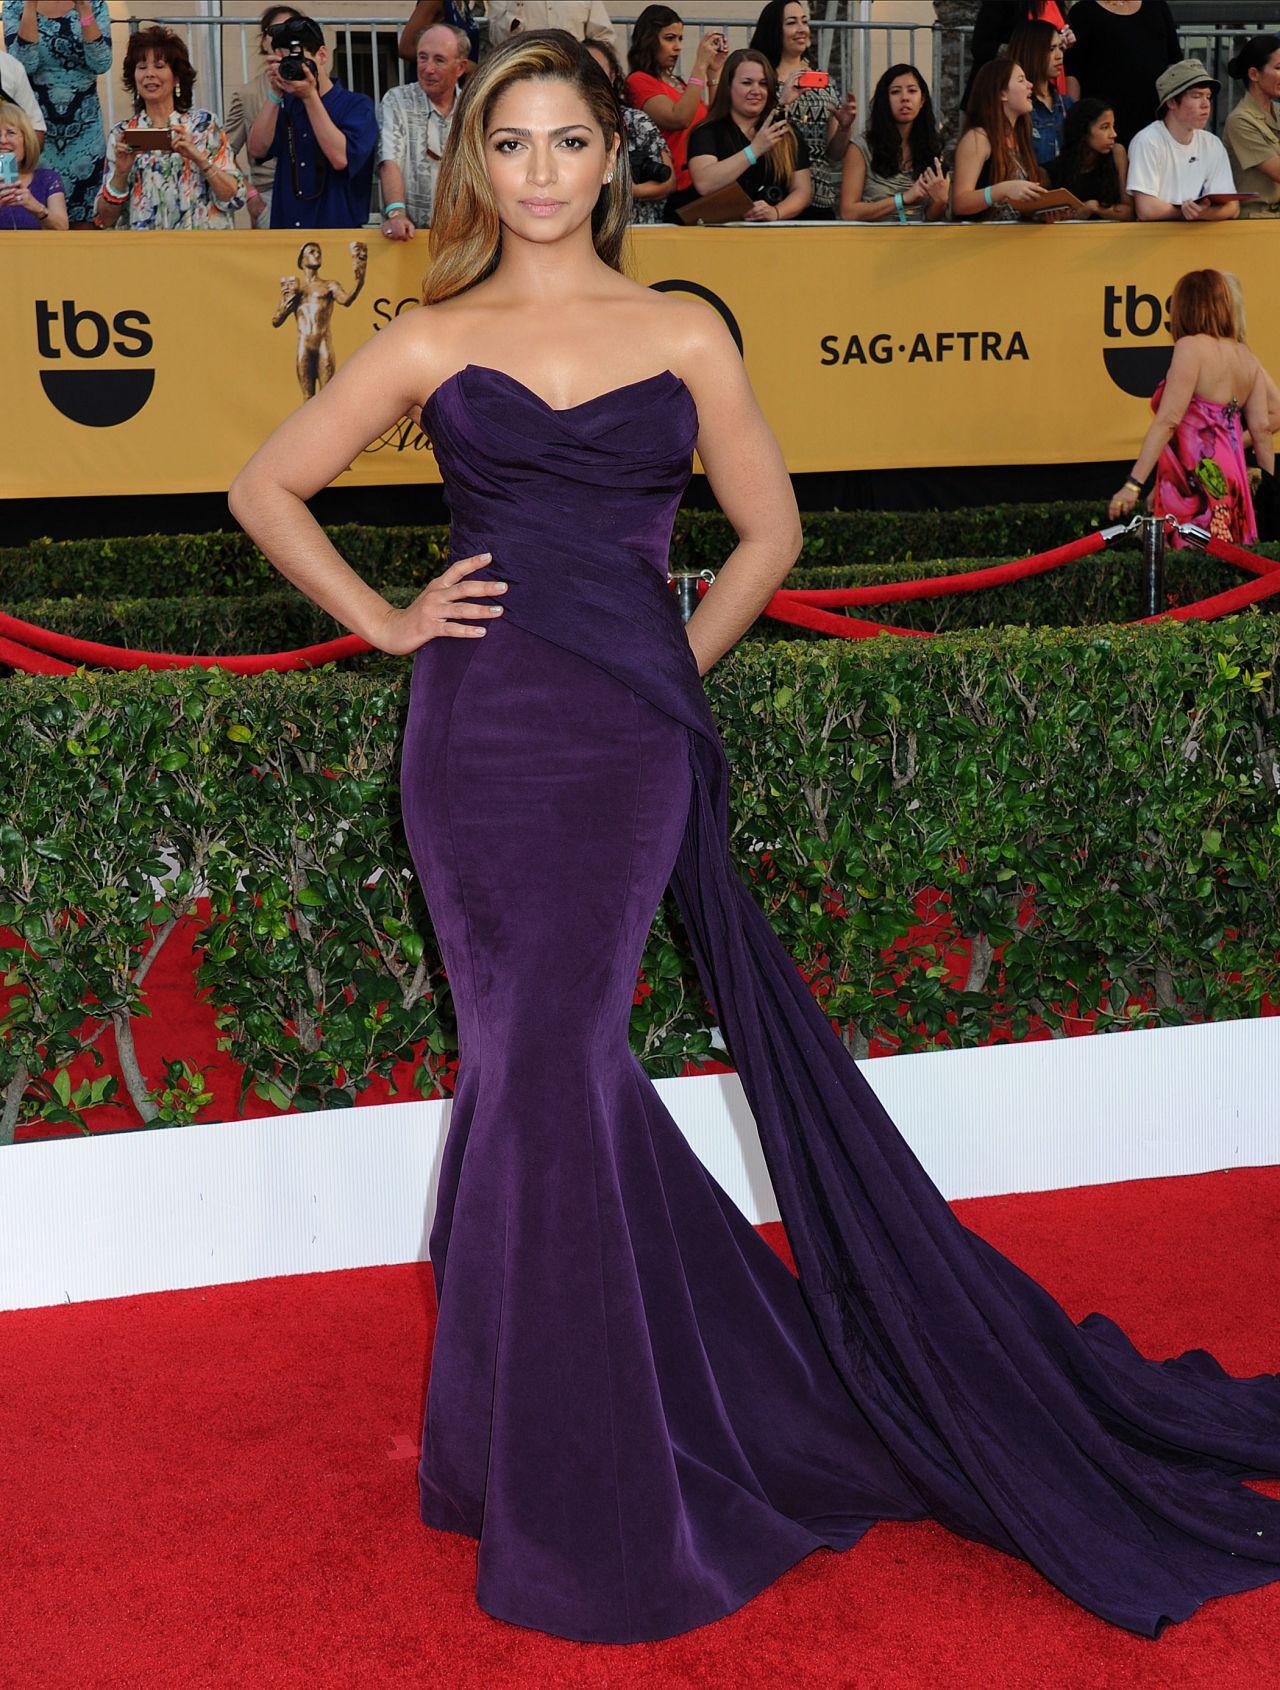 Camila Alves - 2015 SAG Awards in Los Angeles • CelebMafia